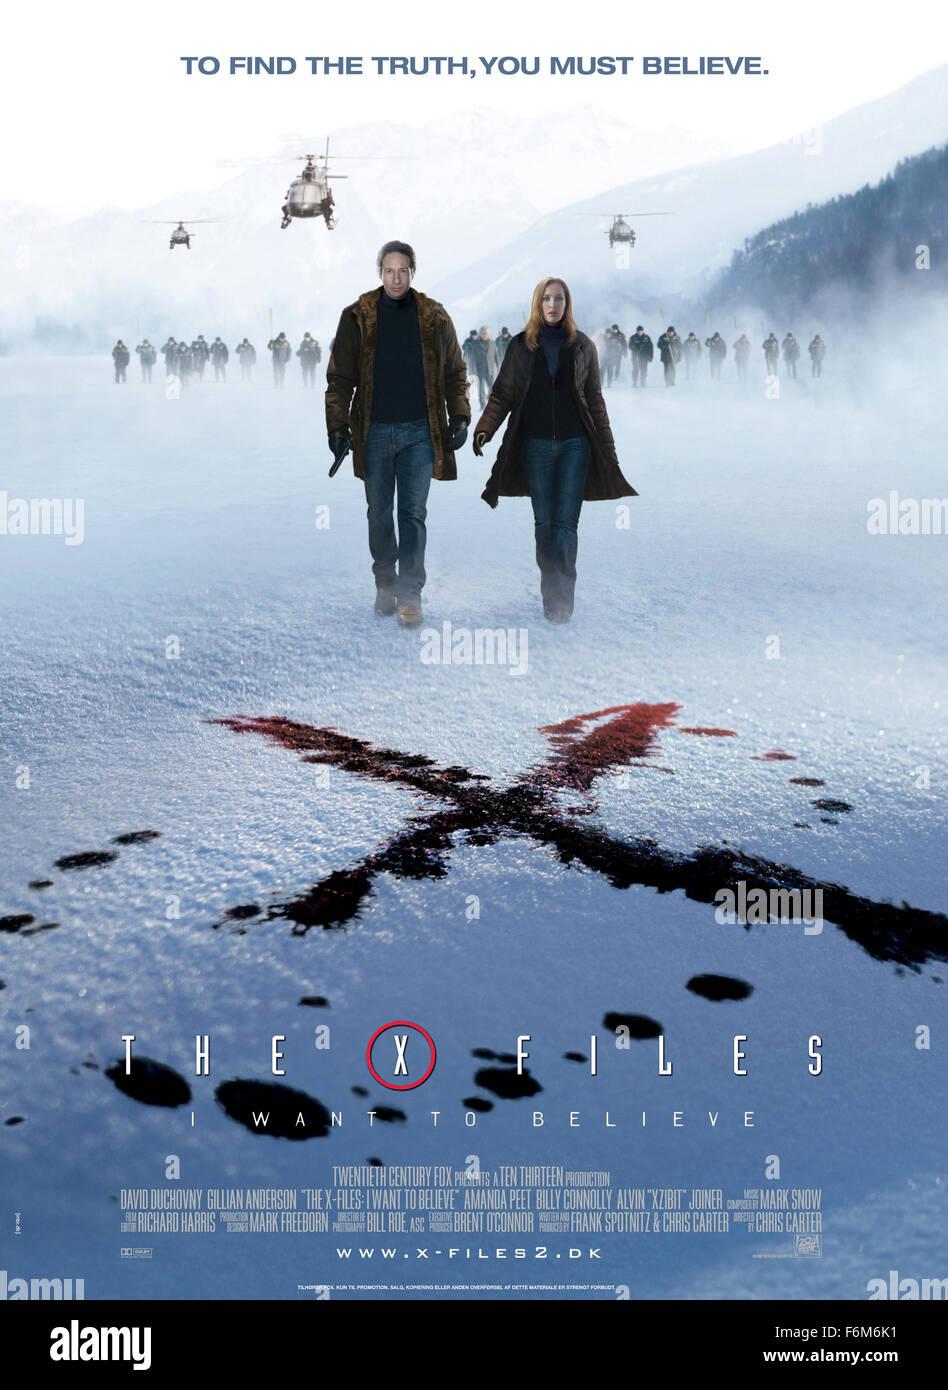 RELEASE DATE: 25 July 2008. MOVIE TITLE: The X Files: I Want to Believe. STUDIO: Twentieth Century-Fox Film. PLOT: Stock Photo